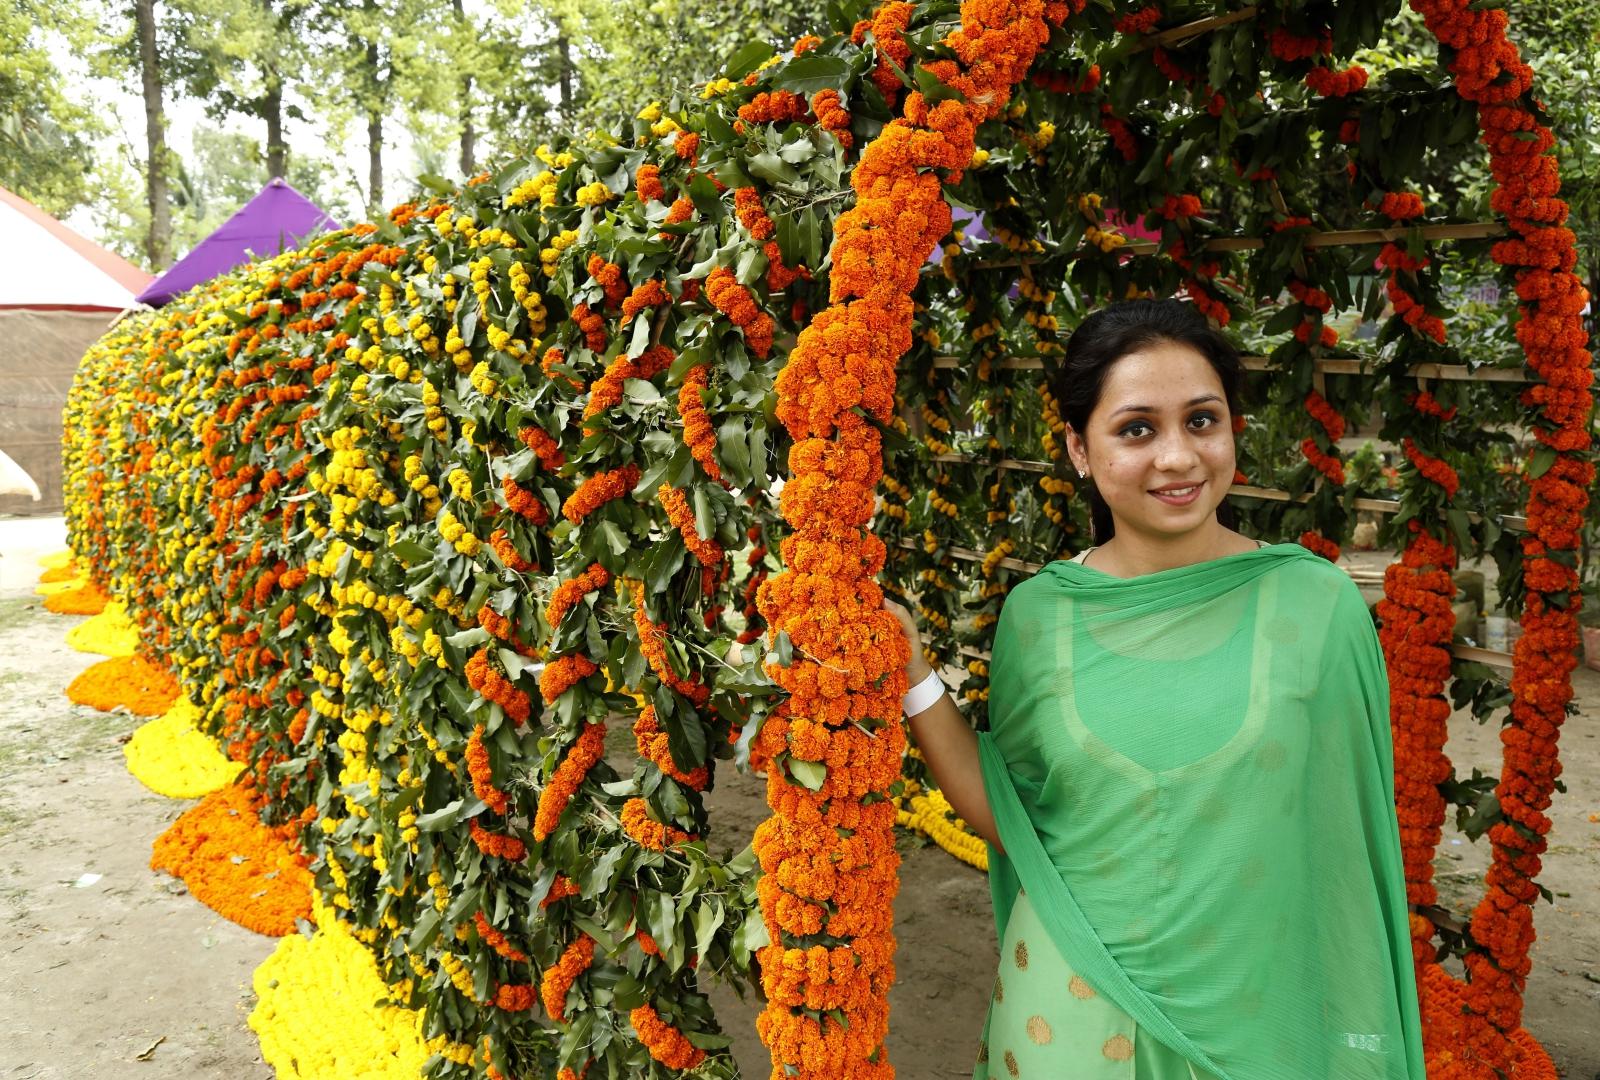 Festiwal Kwiatów w Bangladeszu. Fot. PAP/EPA/ABIR ABDULLAH